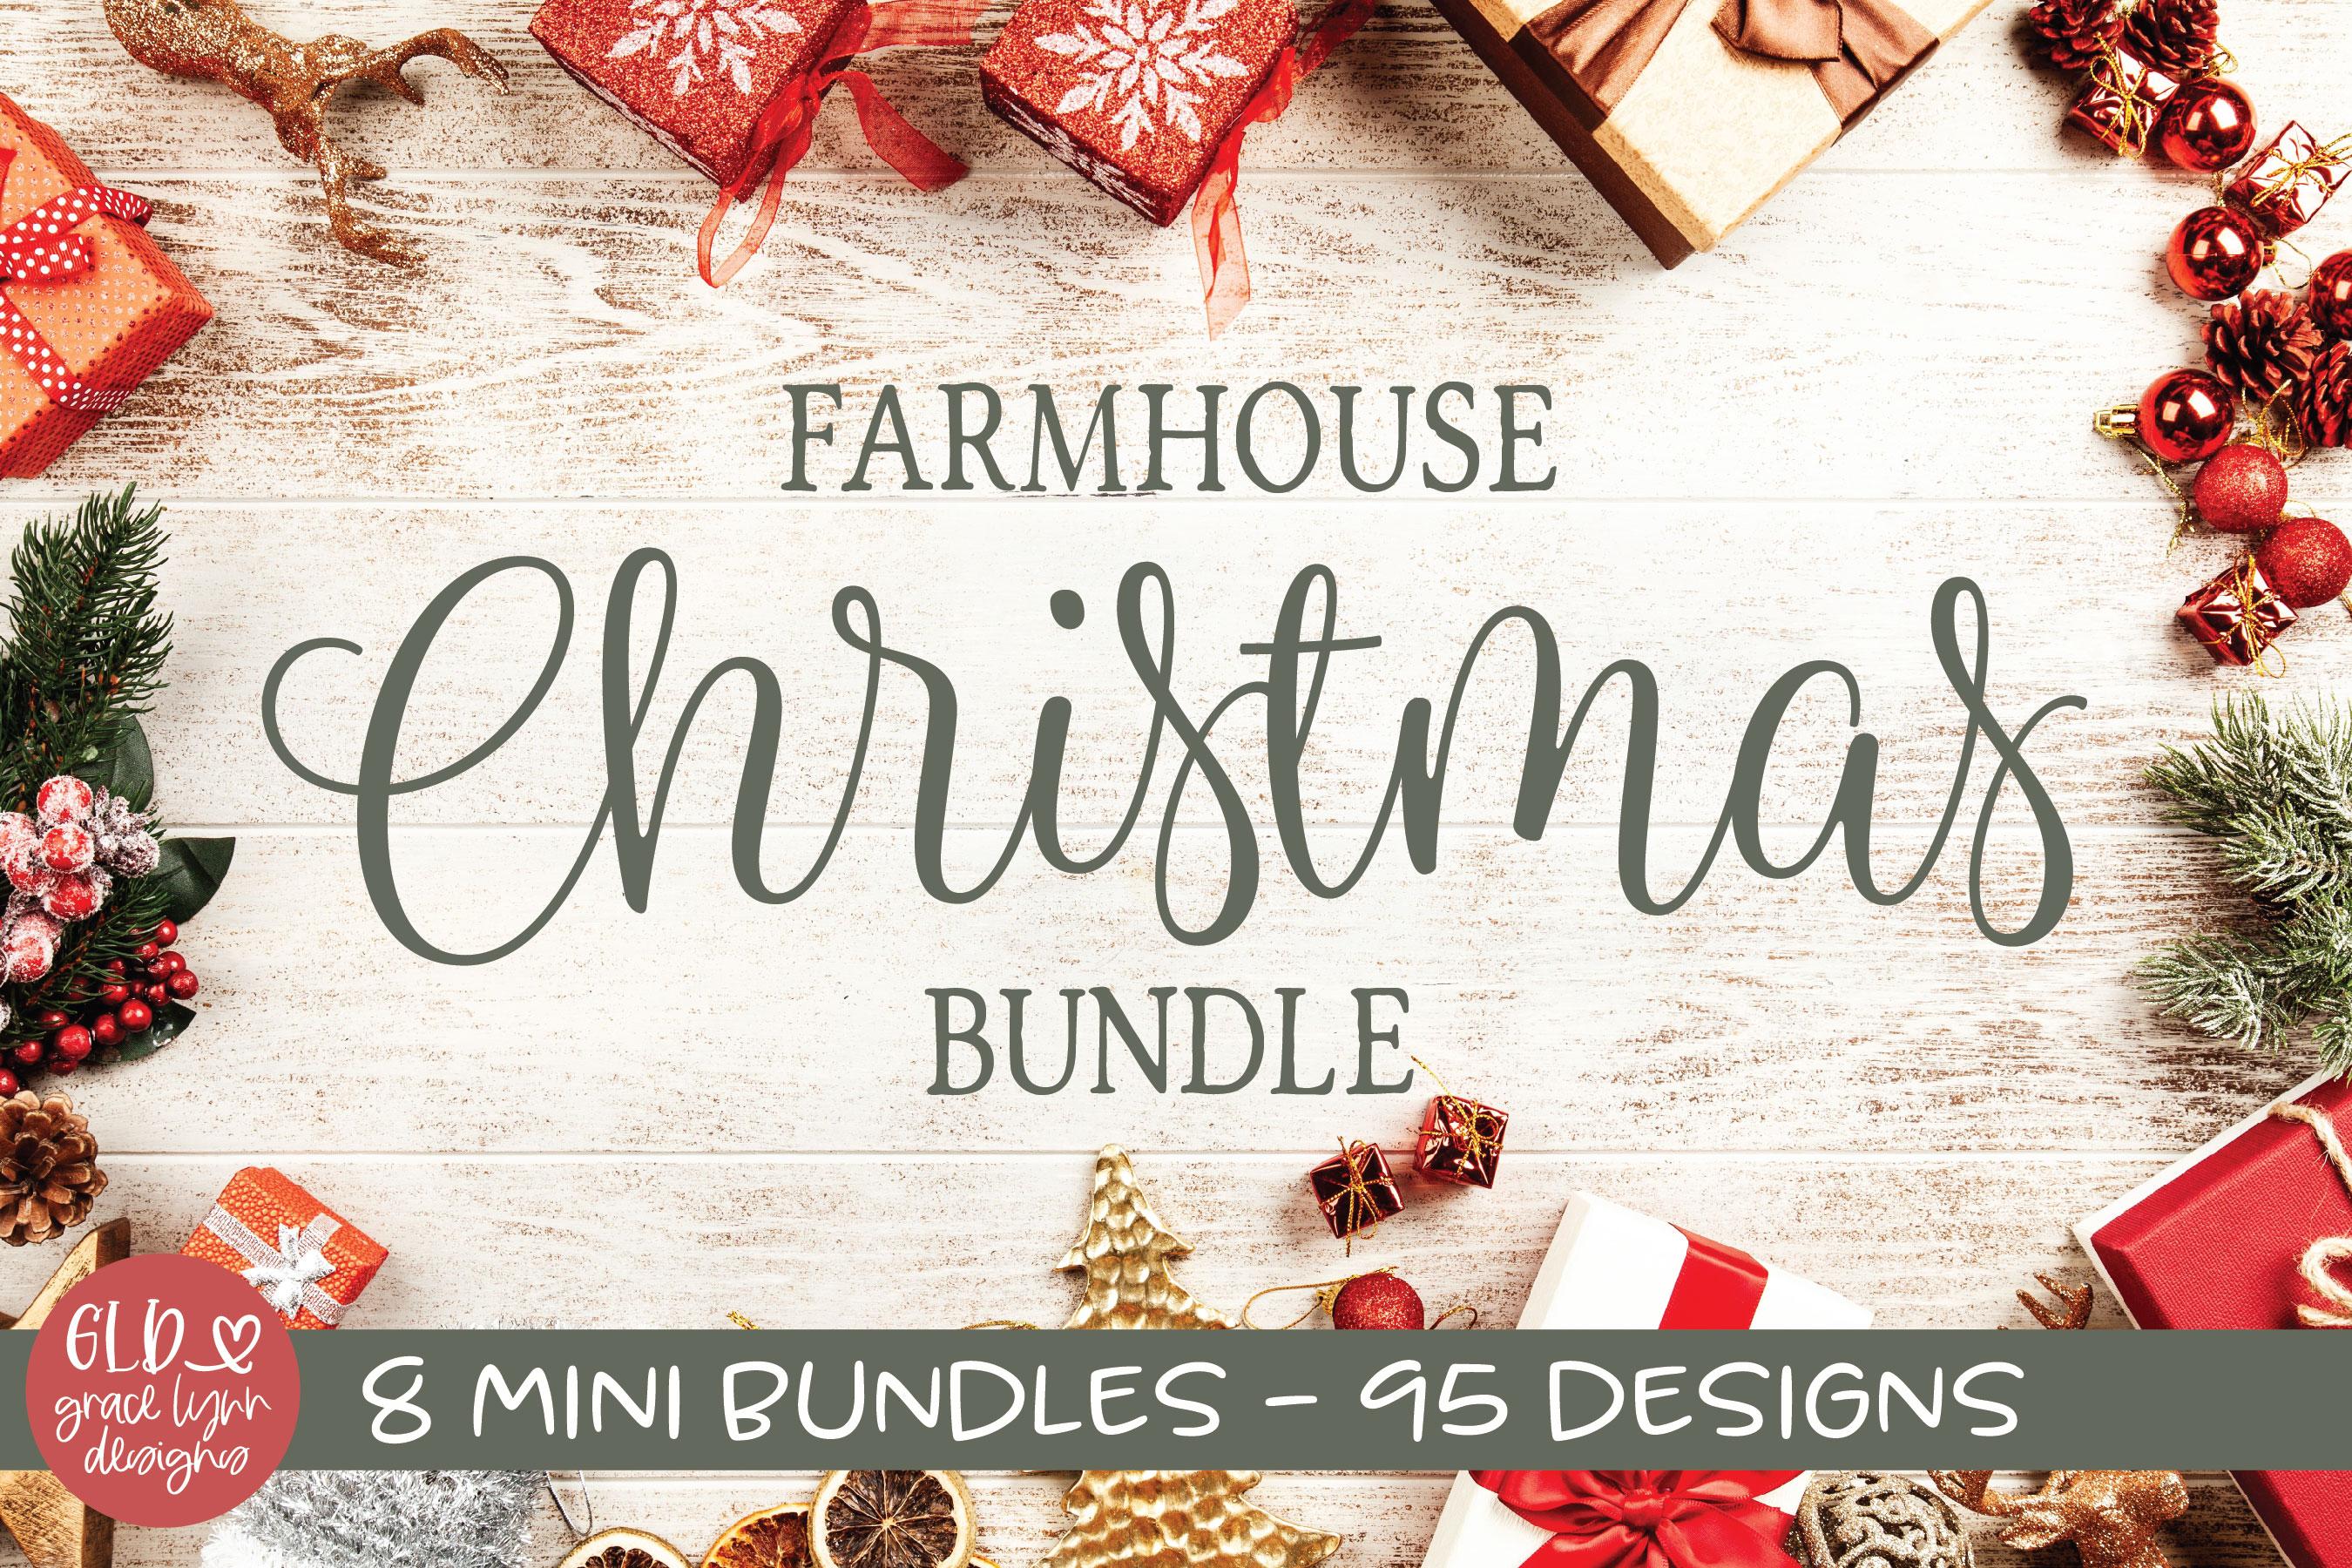 Farmhouse Christmas Bundle - 95 Christmas Designs example image 1